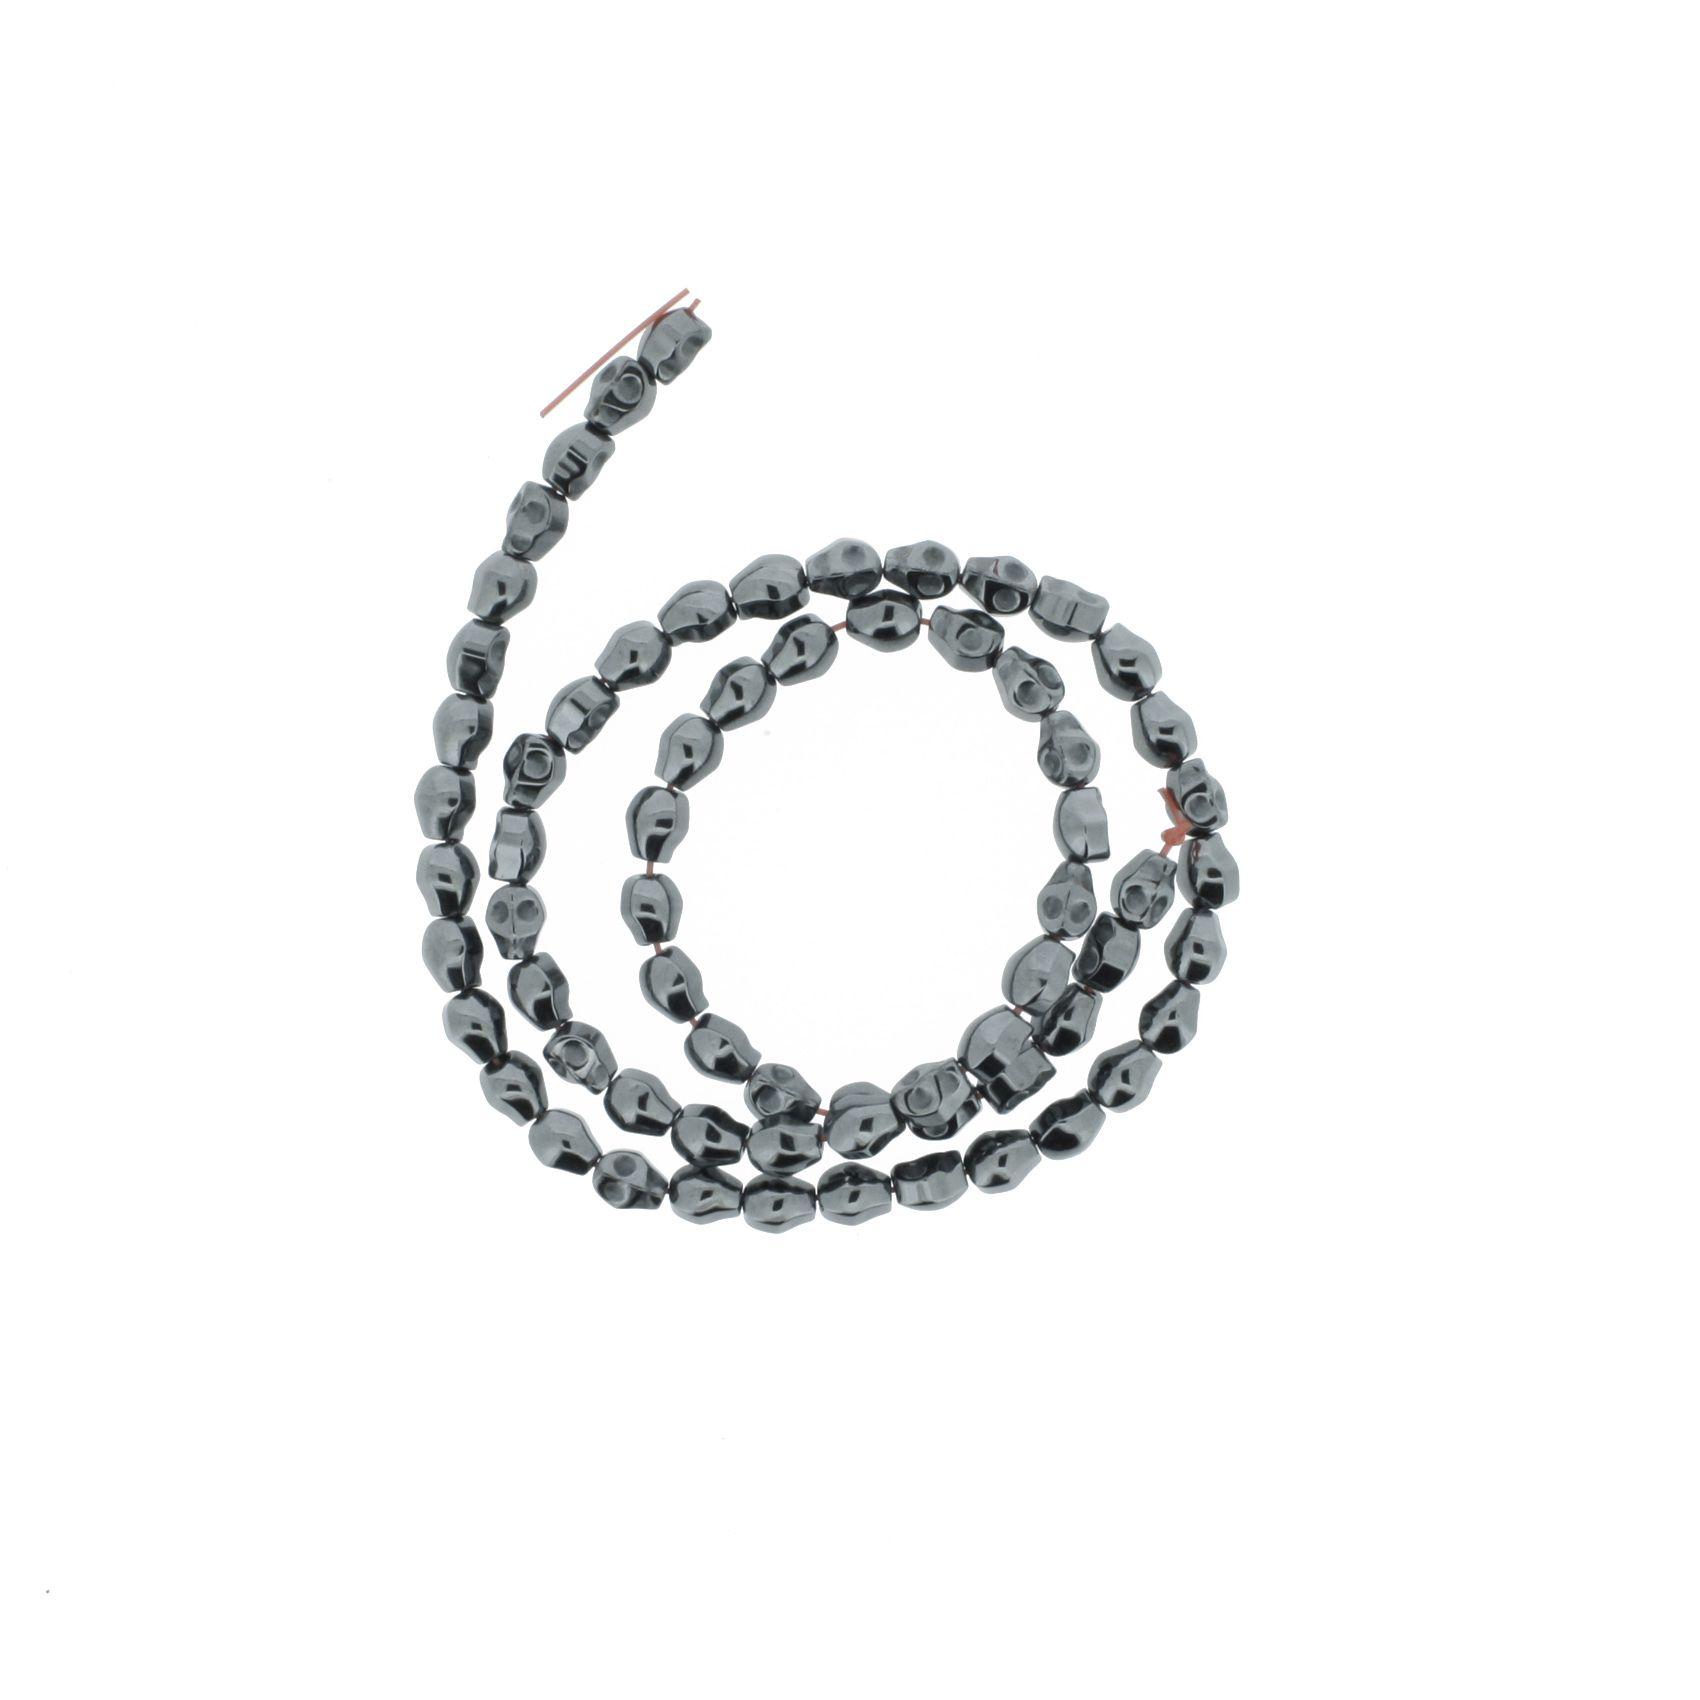 Fio de Pedra - Hematita Caveira - 6mm  - Stéphanie Bijoux® - Peças para Bijuterias e Artesanato